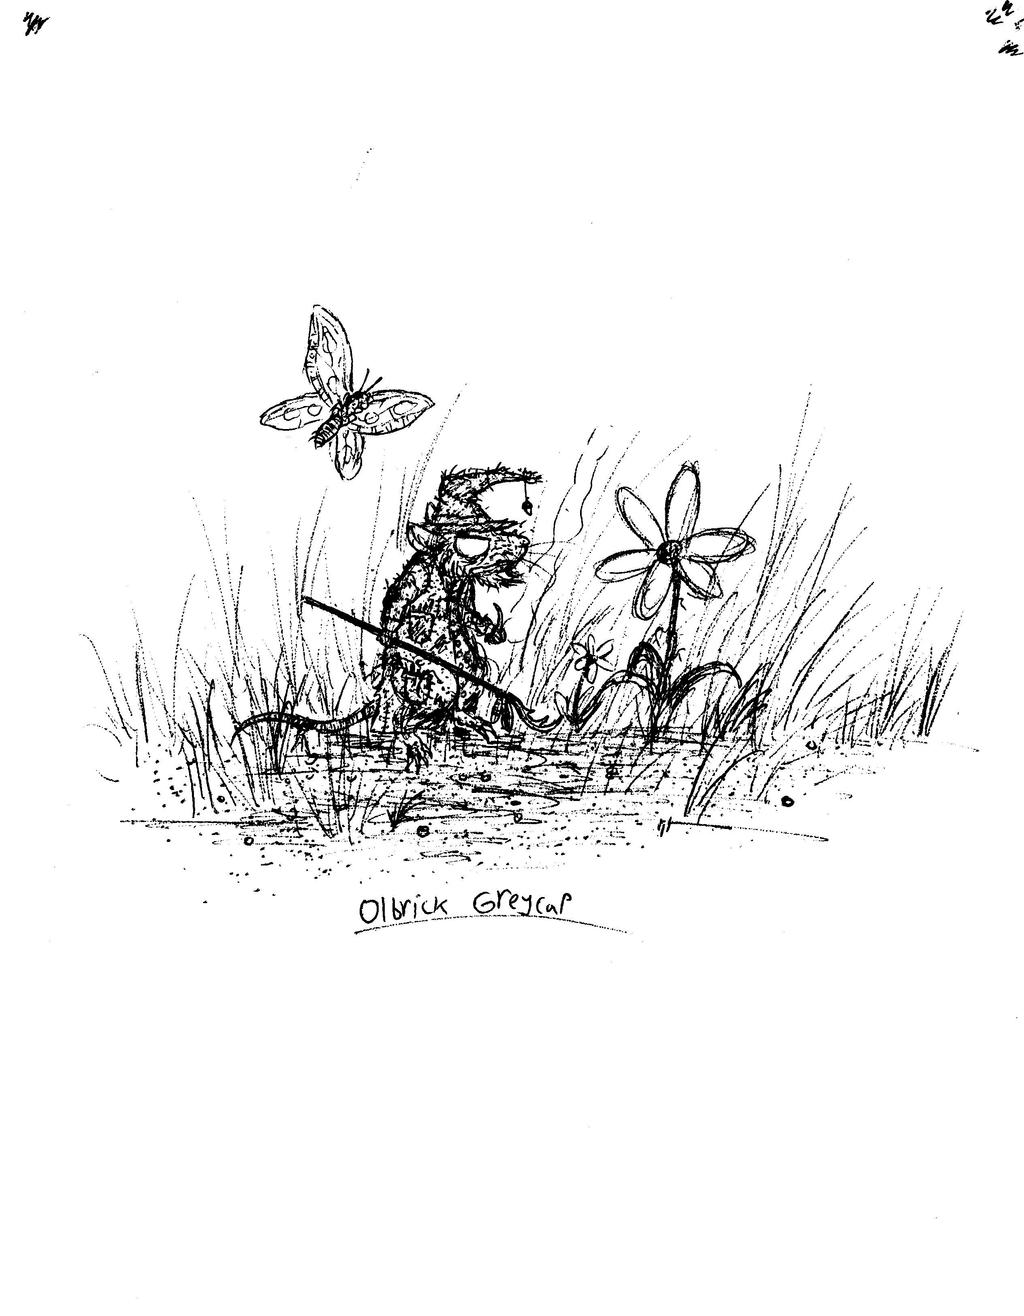 Olbrick Greycap by Ratbatspider